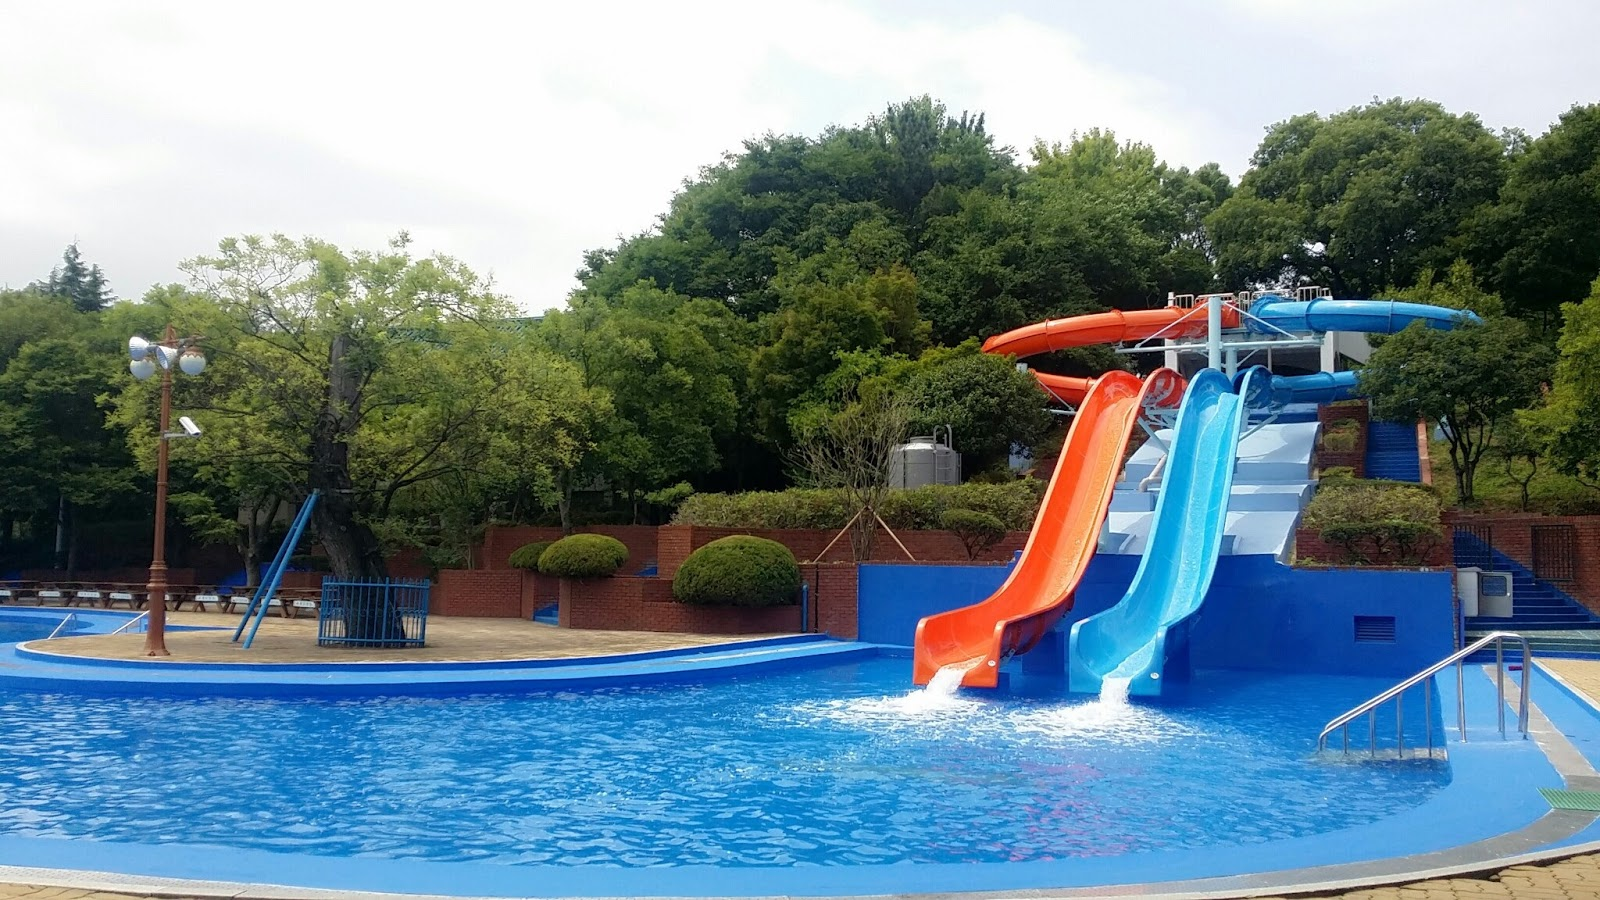 Fun Free Daegu Travel Korea 39 S Outdoor Swimming Pools In Daegu Open To The Public During Summer